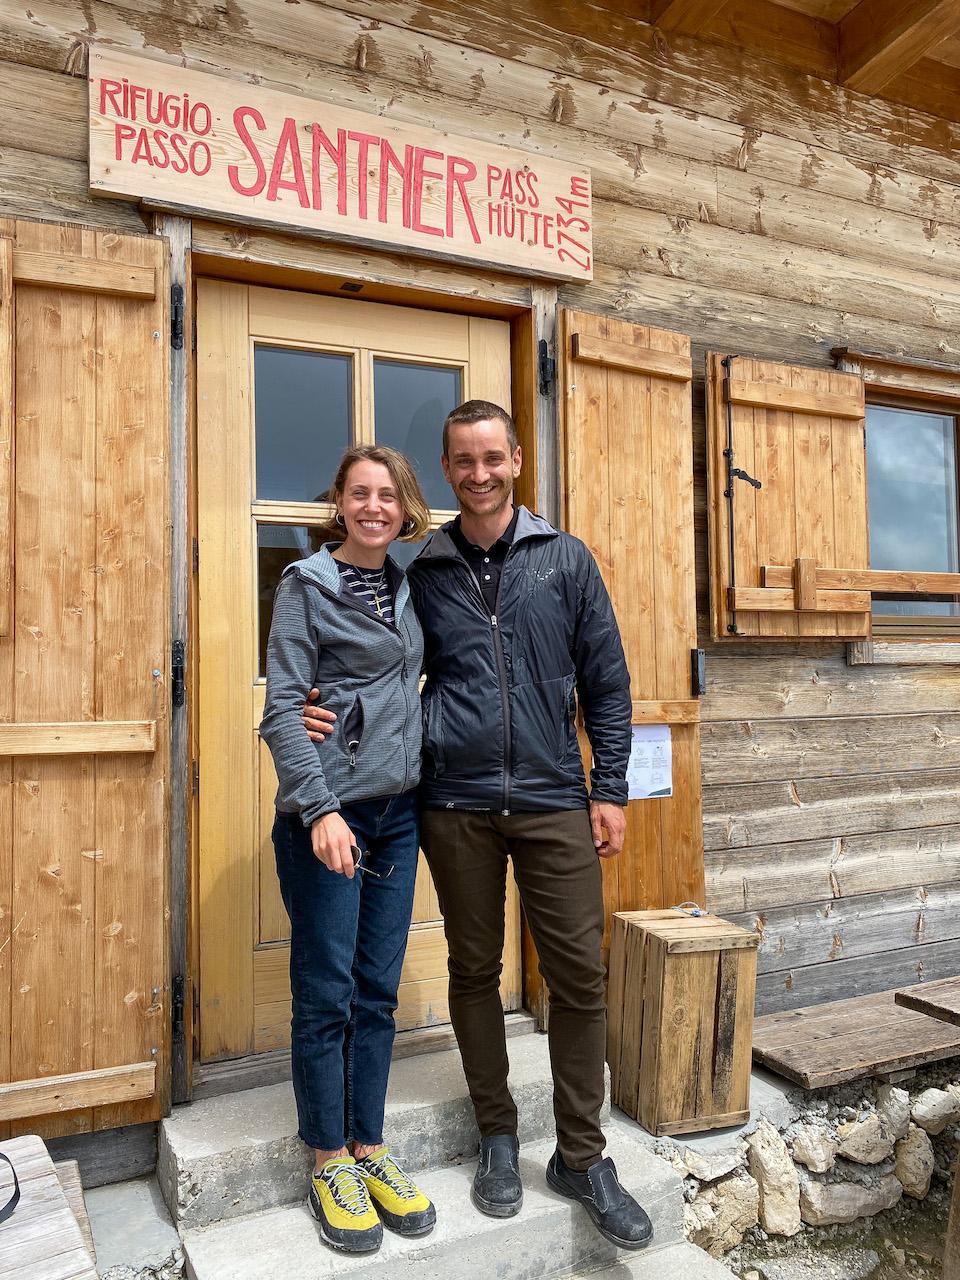 Romina & Michel Santnerpasshütte -Santnerpasshütte - Carezza - Zuid Tirol